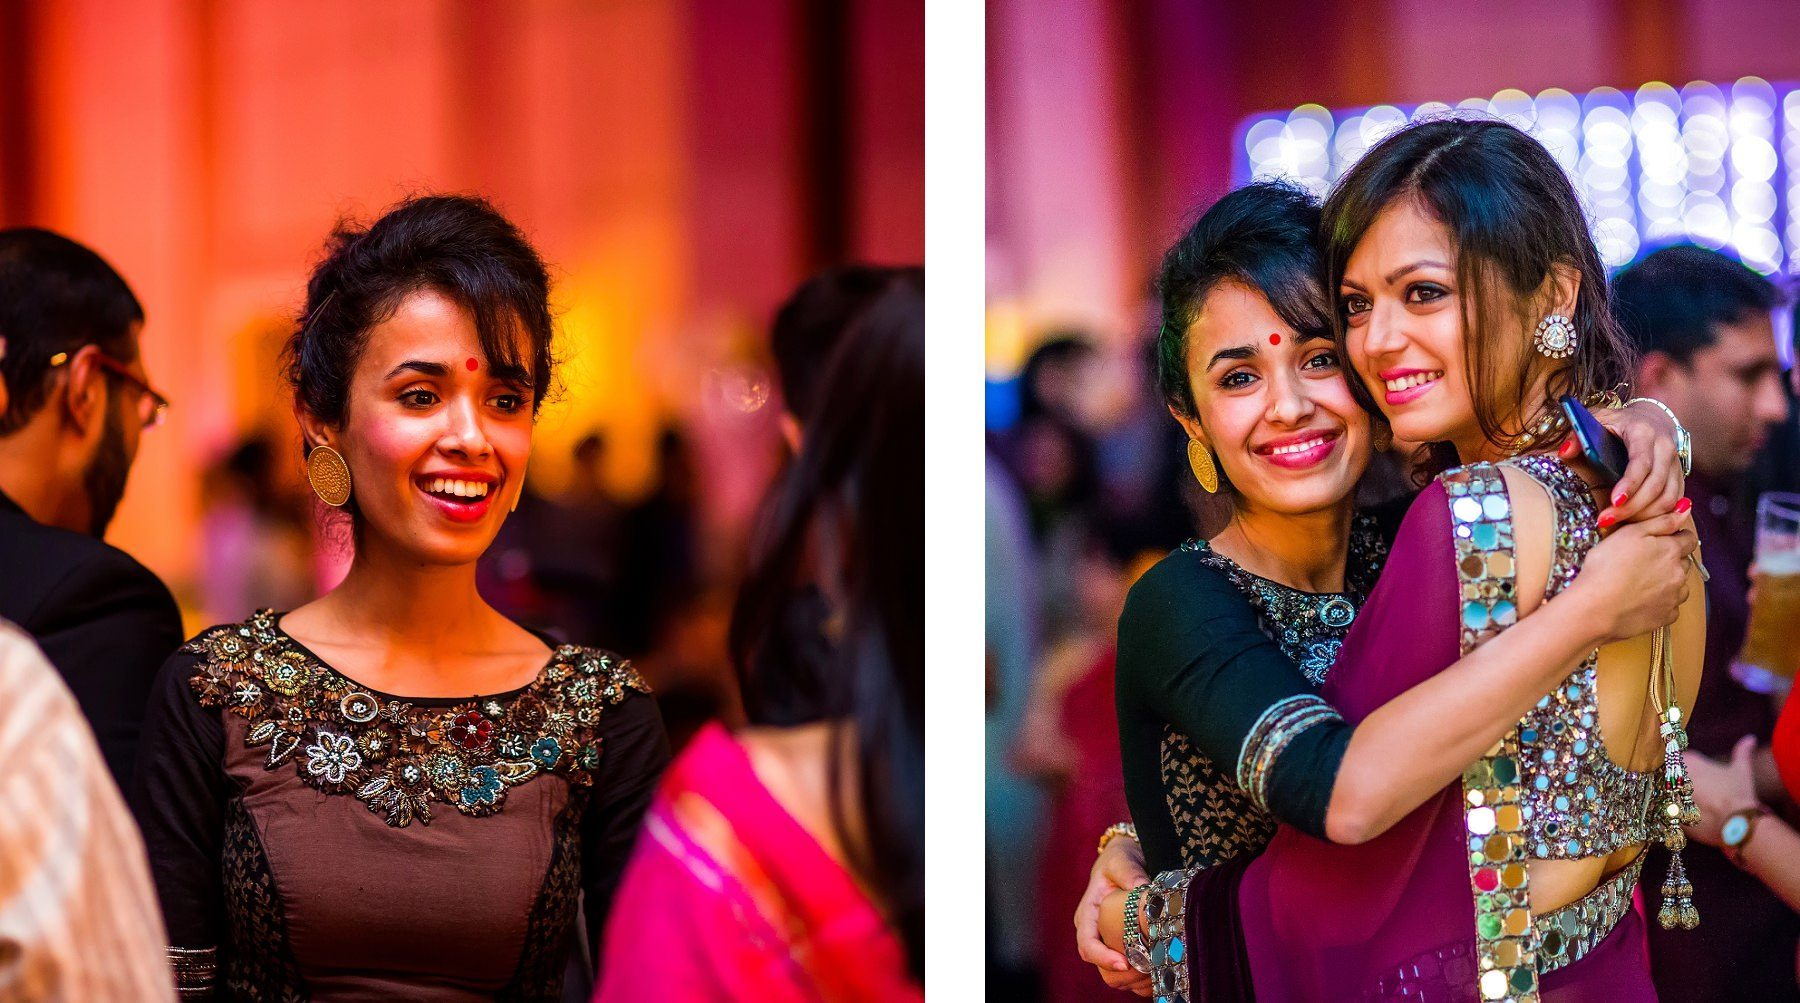 Goa Destination Wedding Photographers